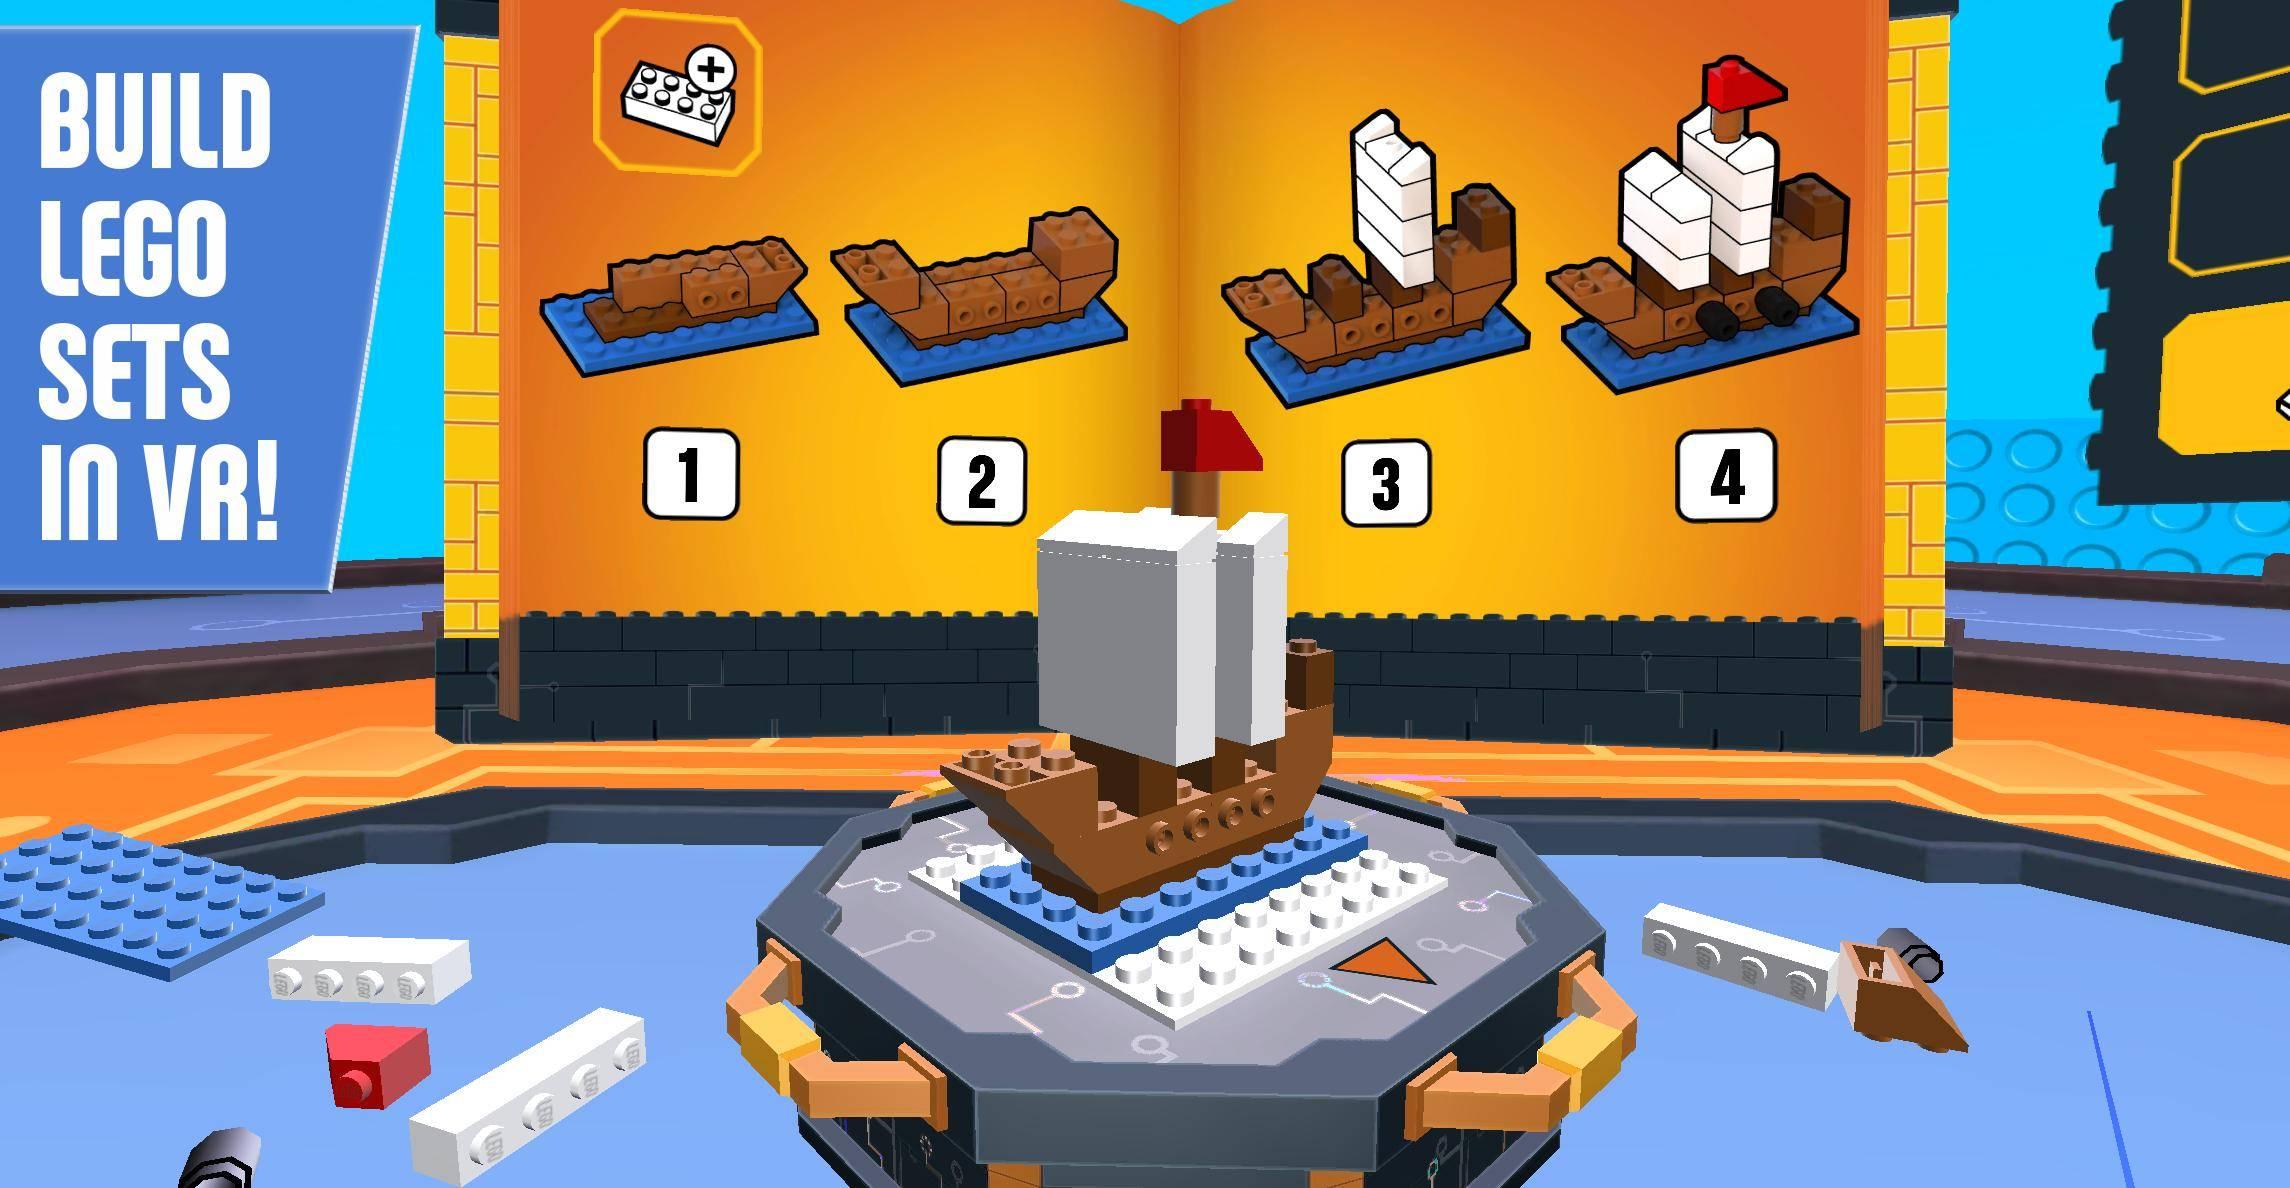 lego brickheadz in VR